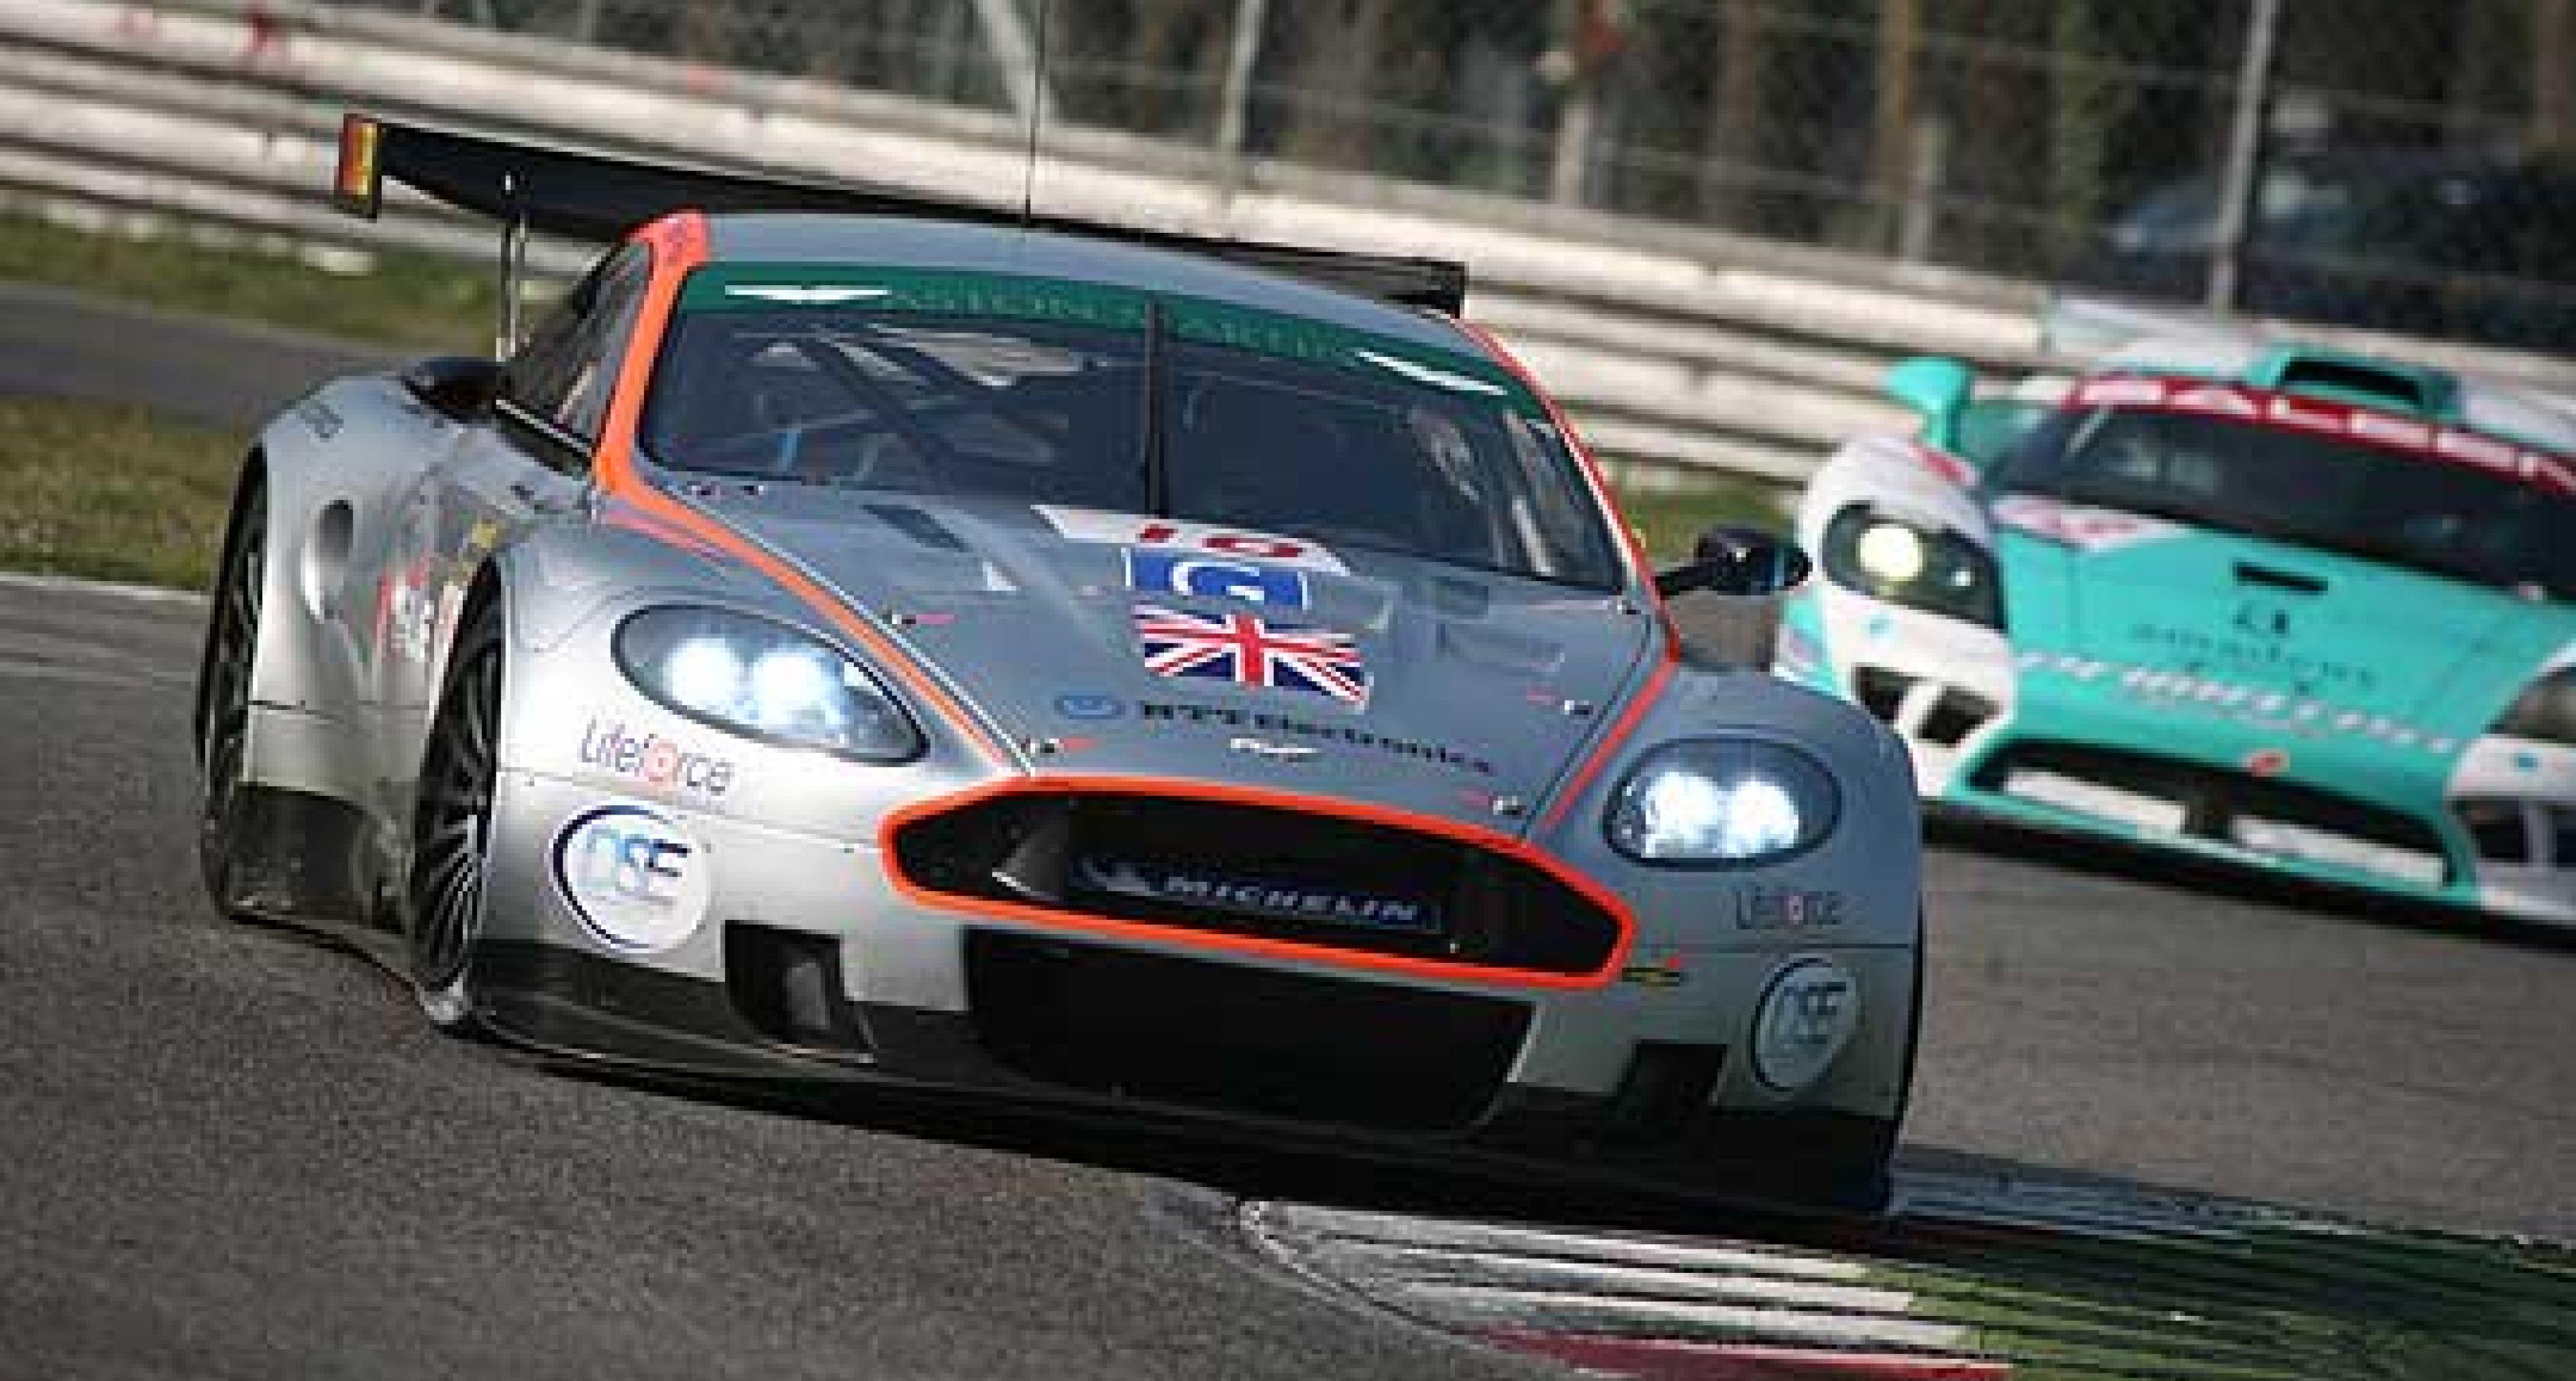 London to Silverstone Supercar Tour